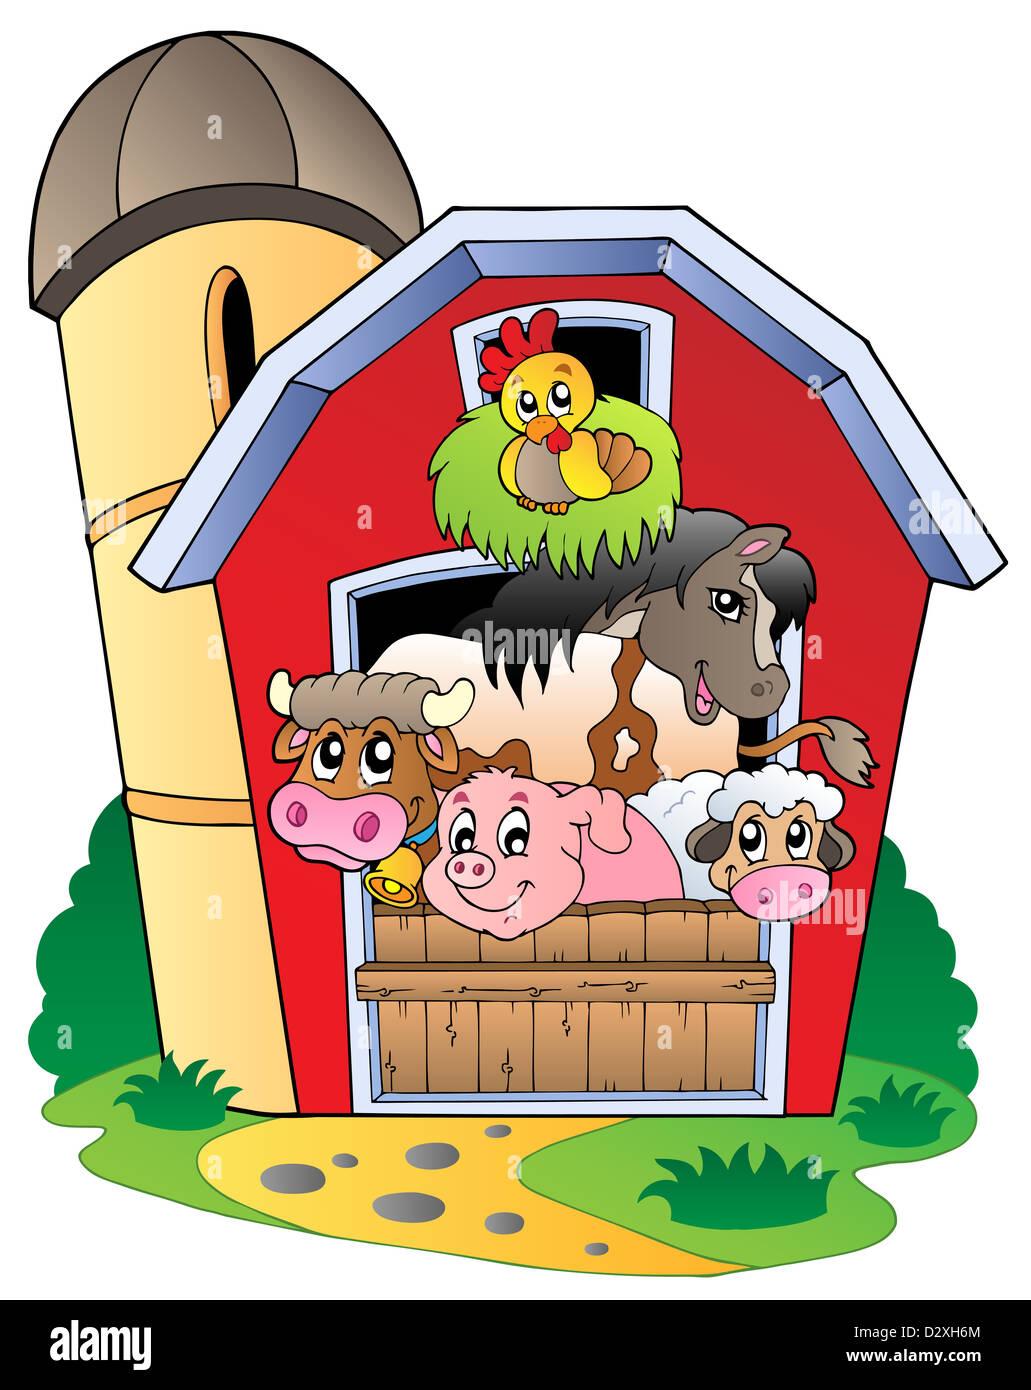 Farmyard Barn Cartoon Stock Photos Farmyard Barn Cartoon